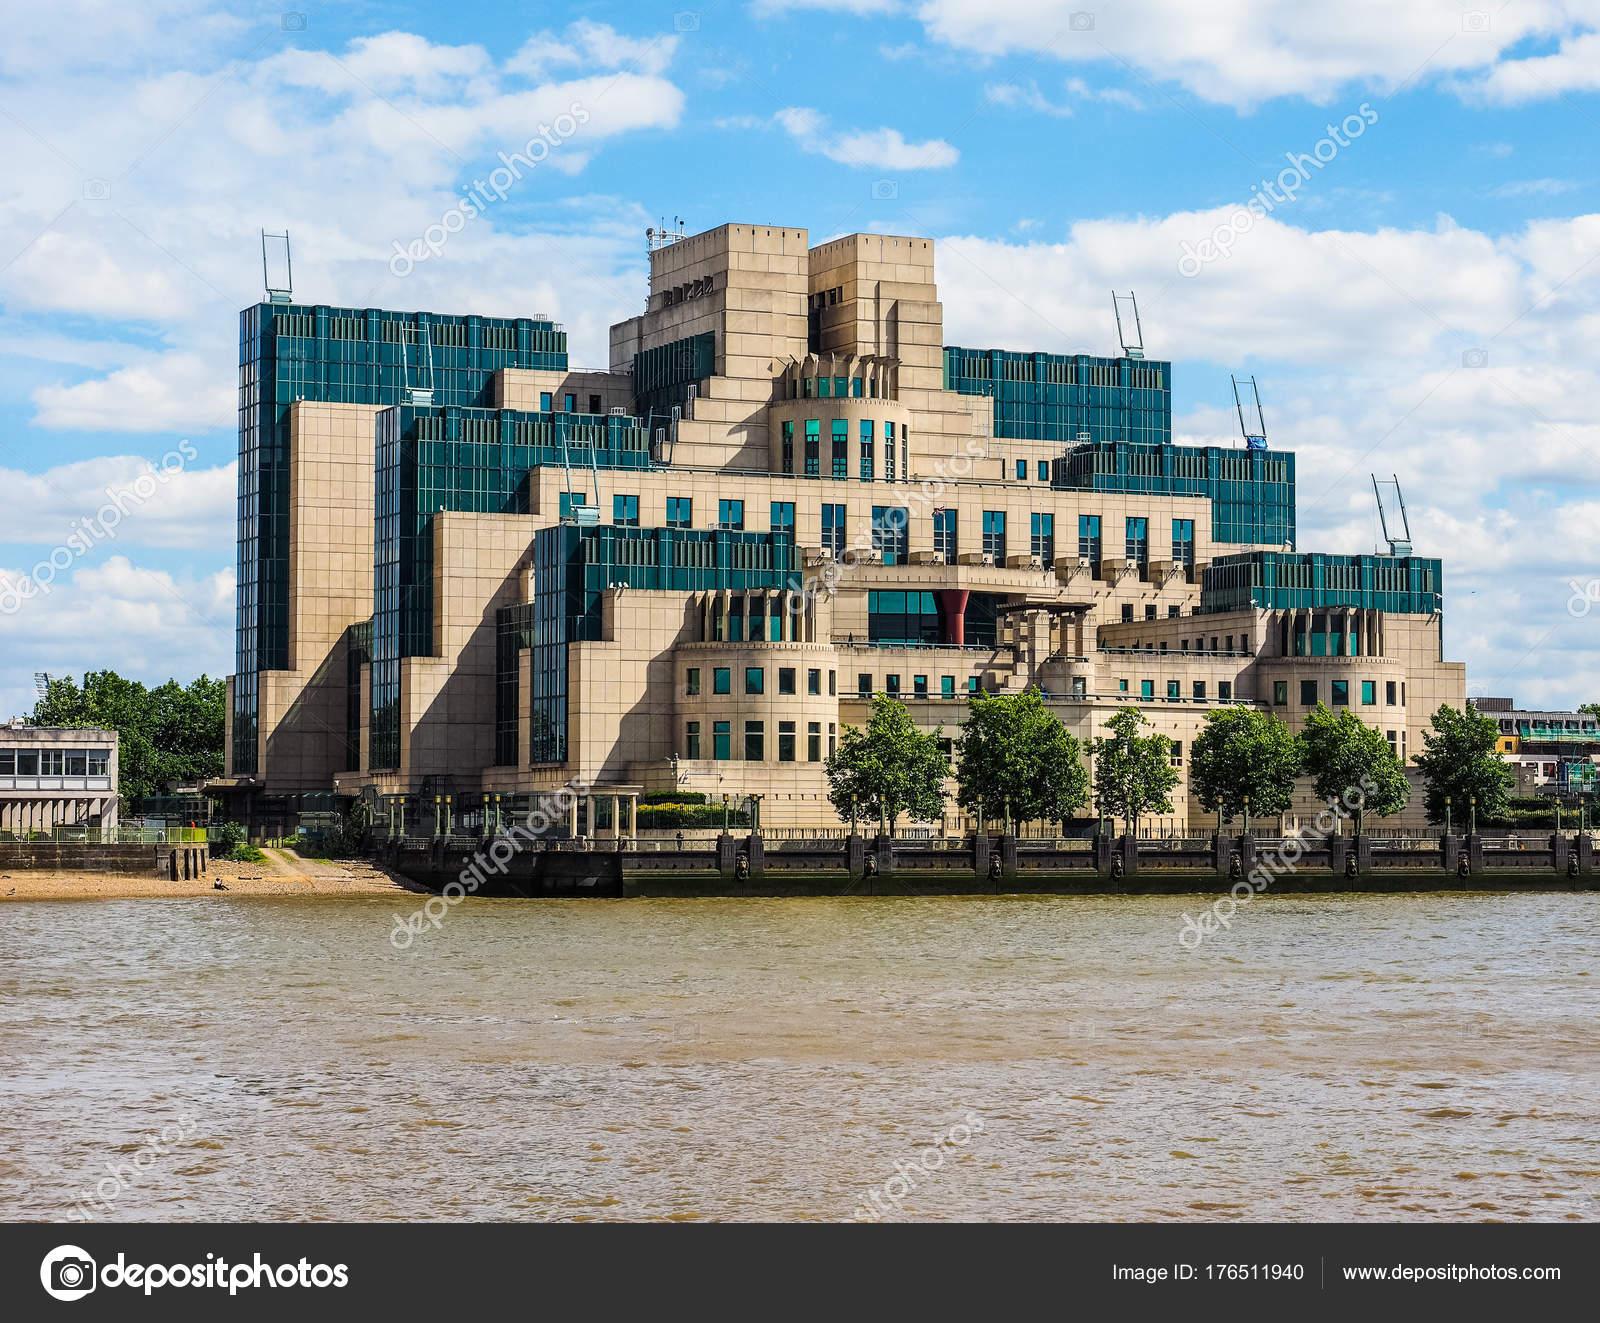 Britse Geheime Dienst In Londen Hdr Redactionele Stockfoto